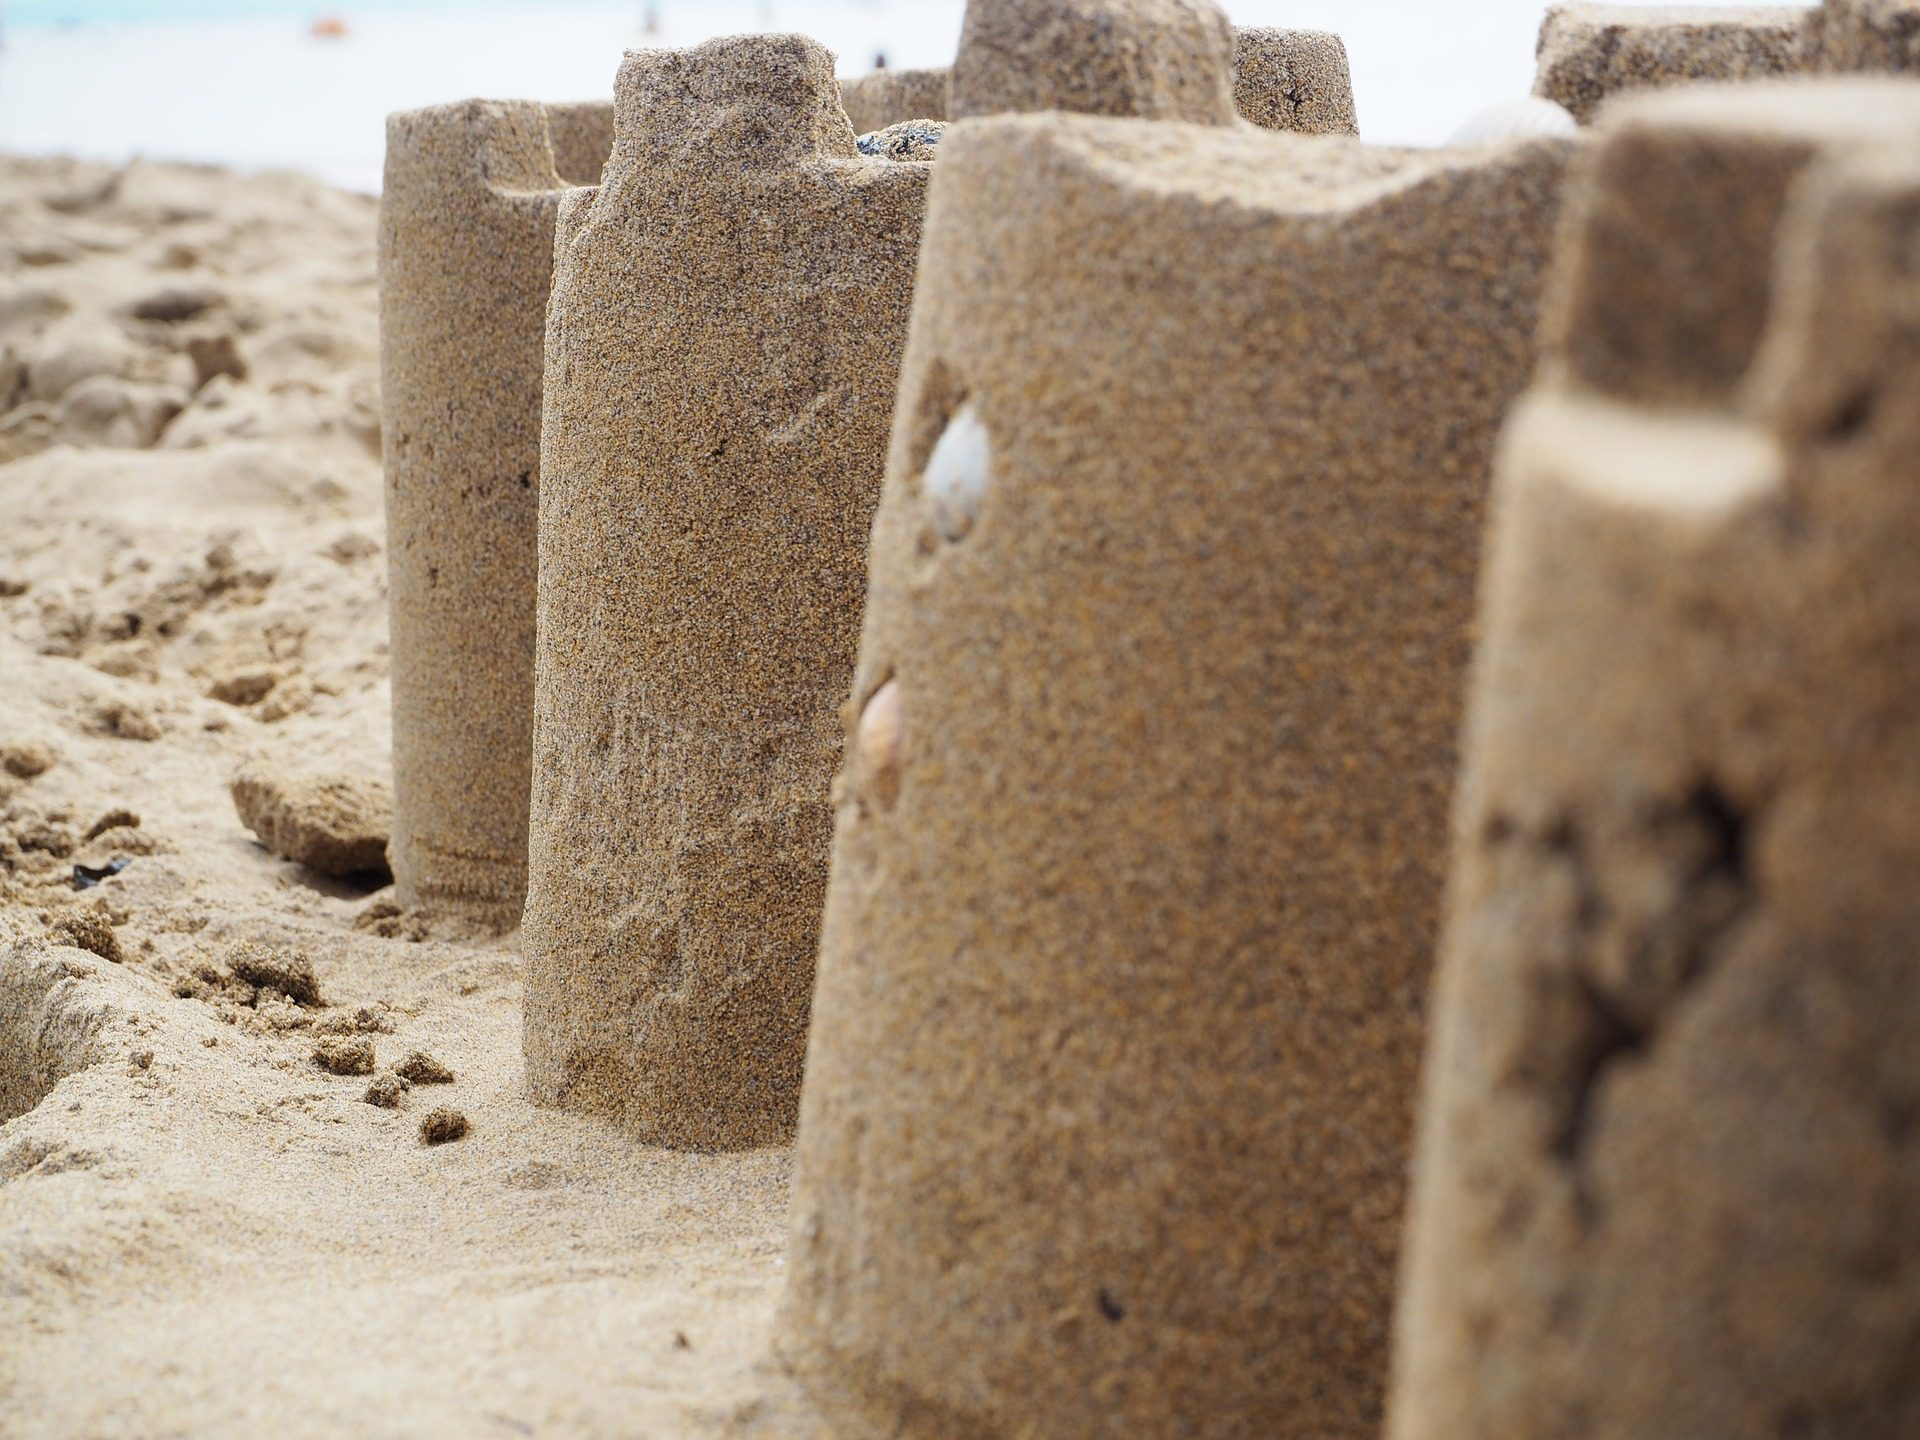 Château, sable, Plage, jeu, Mer - Fonds d'écran HD - Professor-falken.com